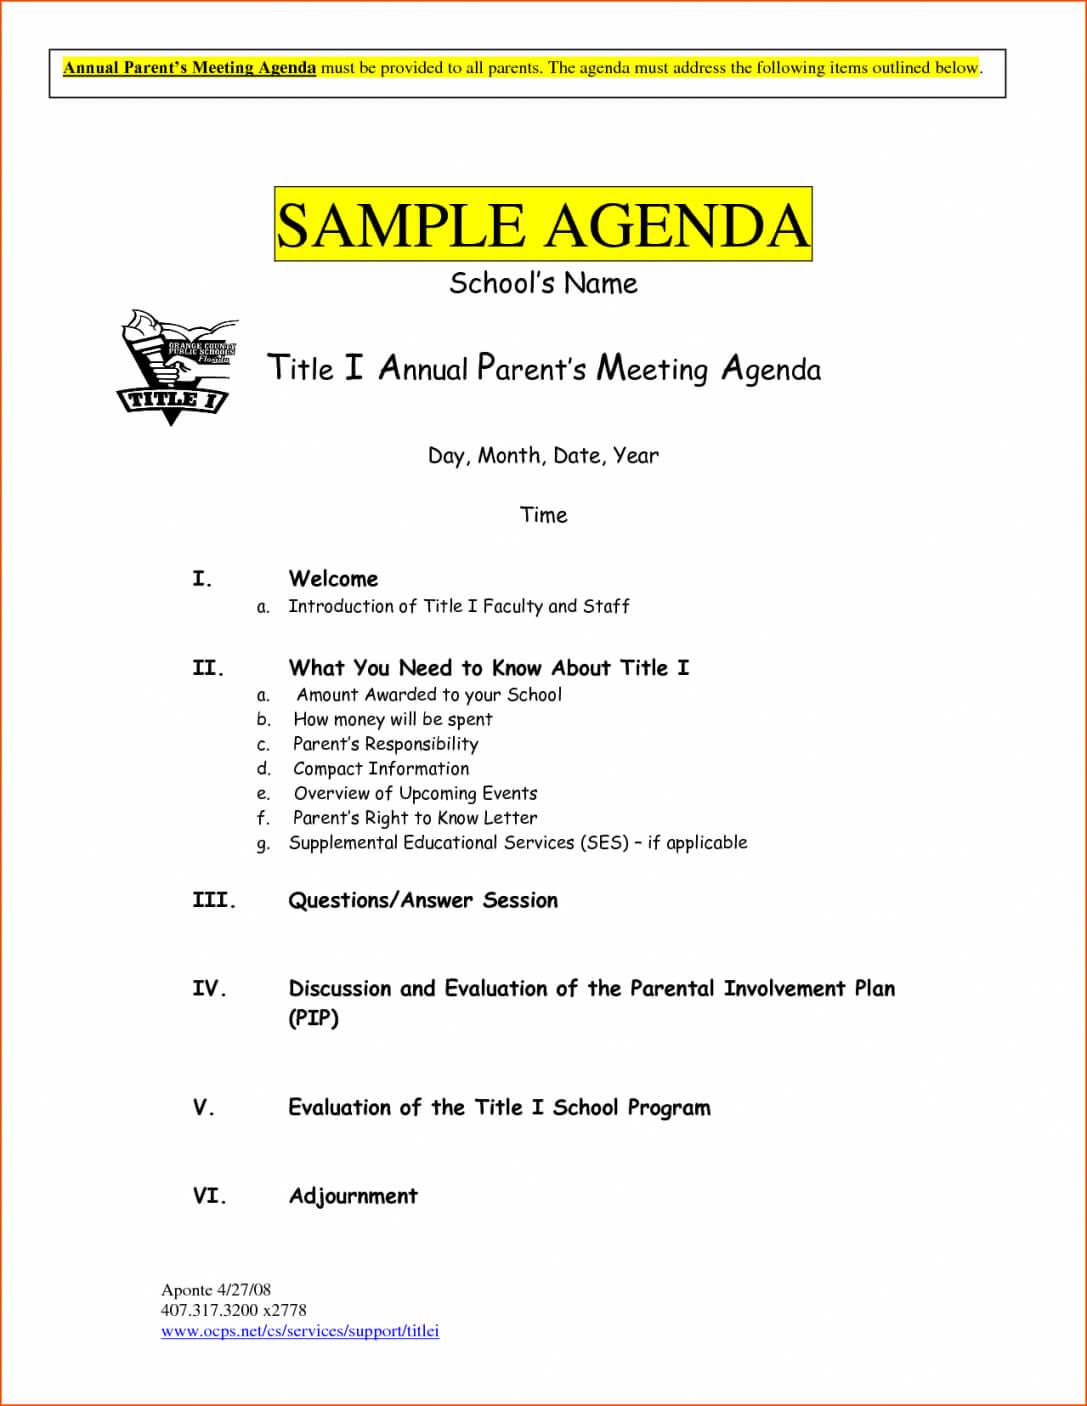 Event Agenda Template Word 3 – Invest Wight Agenda Template throughout Event Agenda Template Word